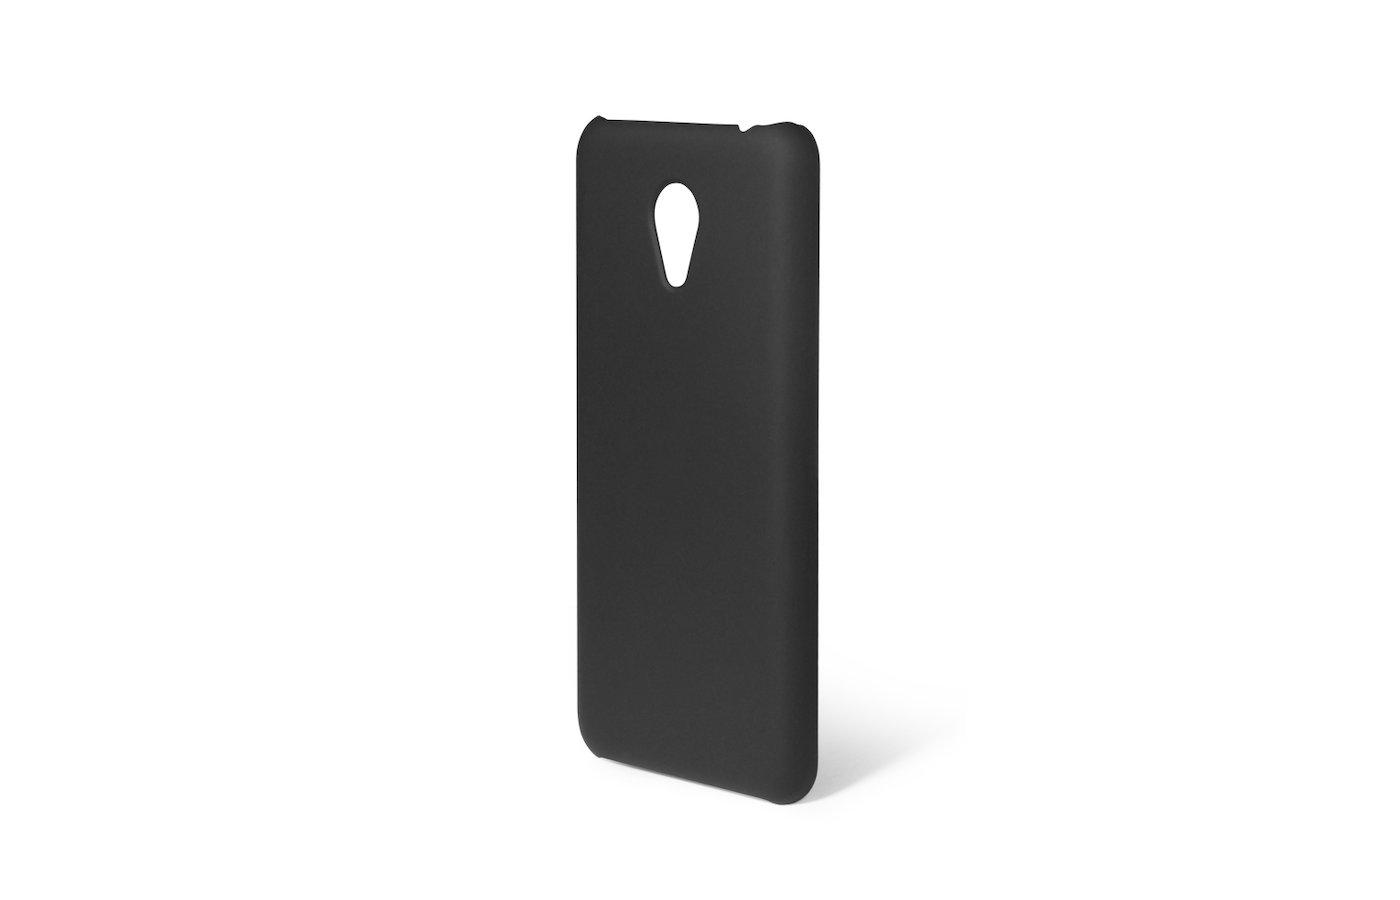 Чехол DF для Meizu M3s mini (mzSlim-01) soft-touch